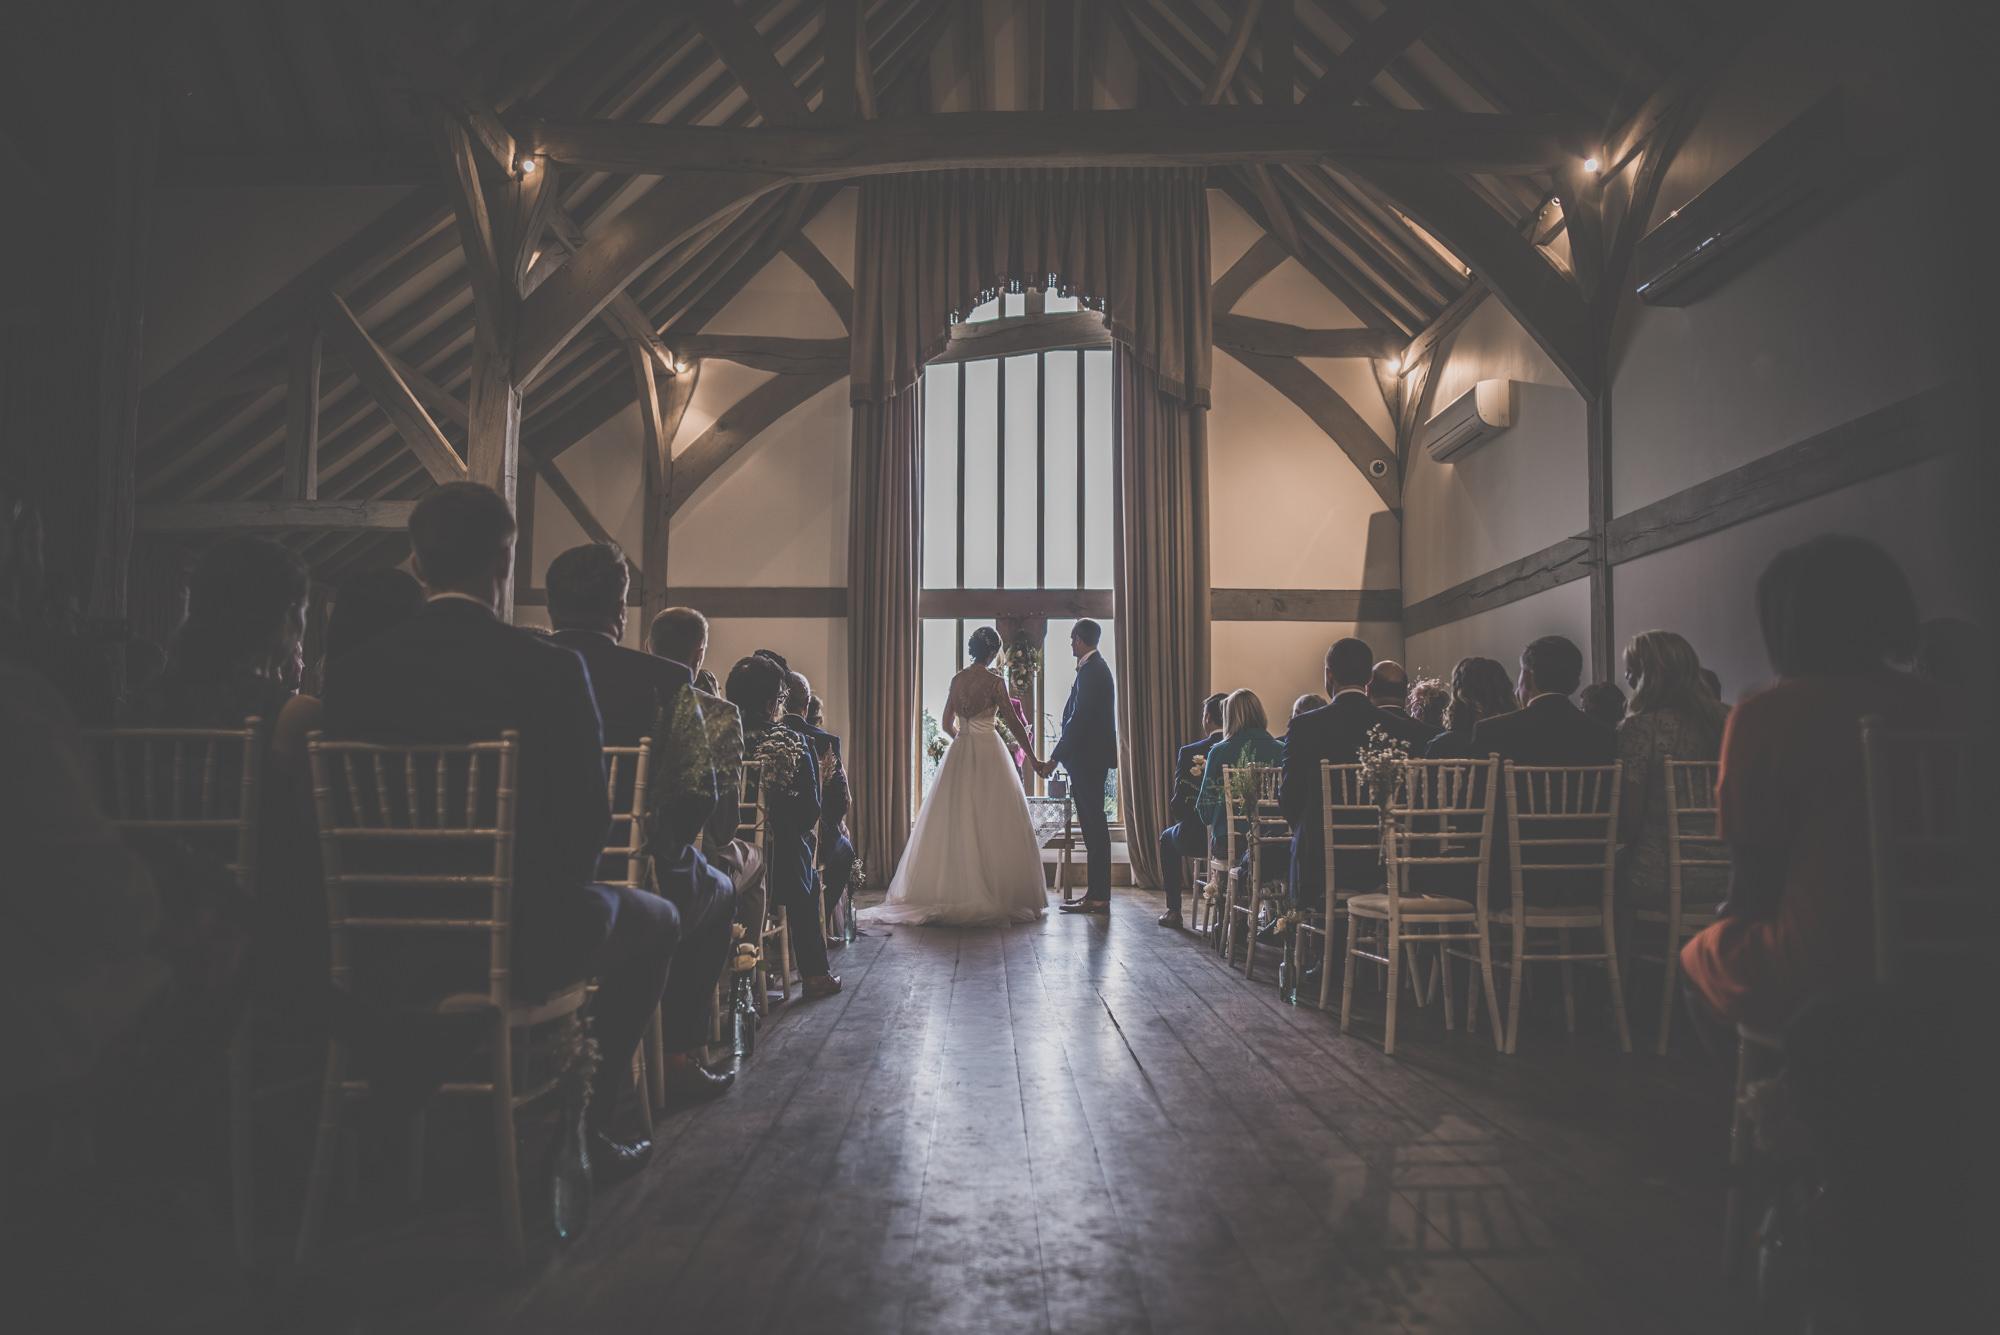 Charisse-and-James-wedding-in-Cain-Manor-Venue-Hampshire-Manu-Mendoza-Wedding-Photography-221.jpg